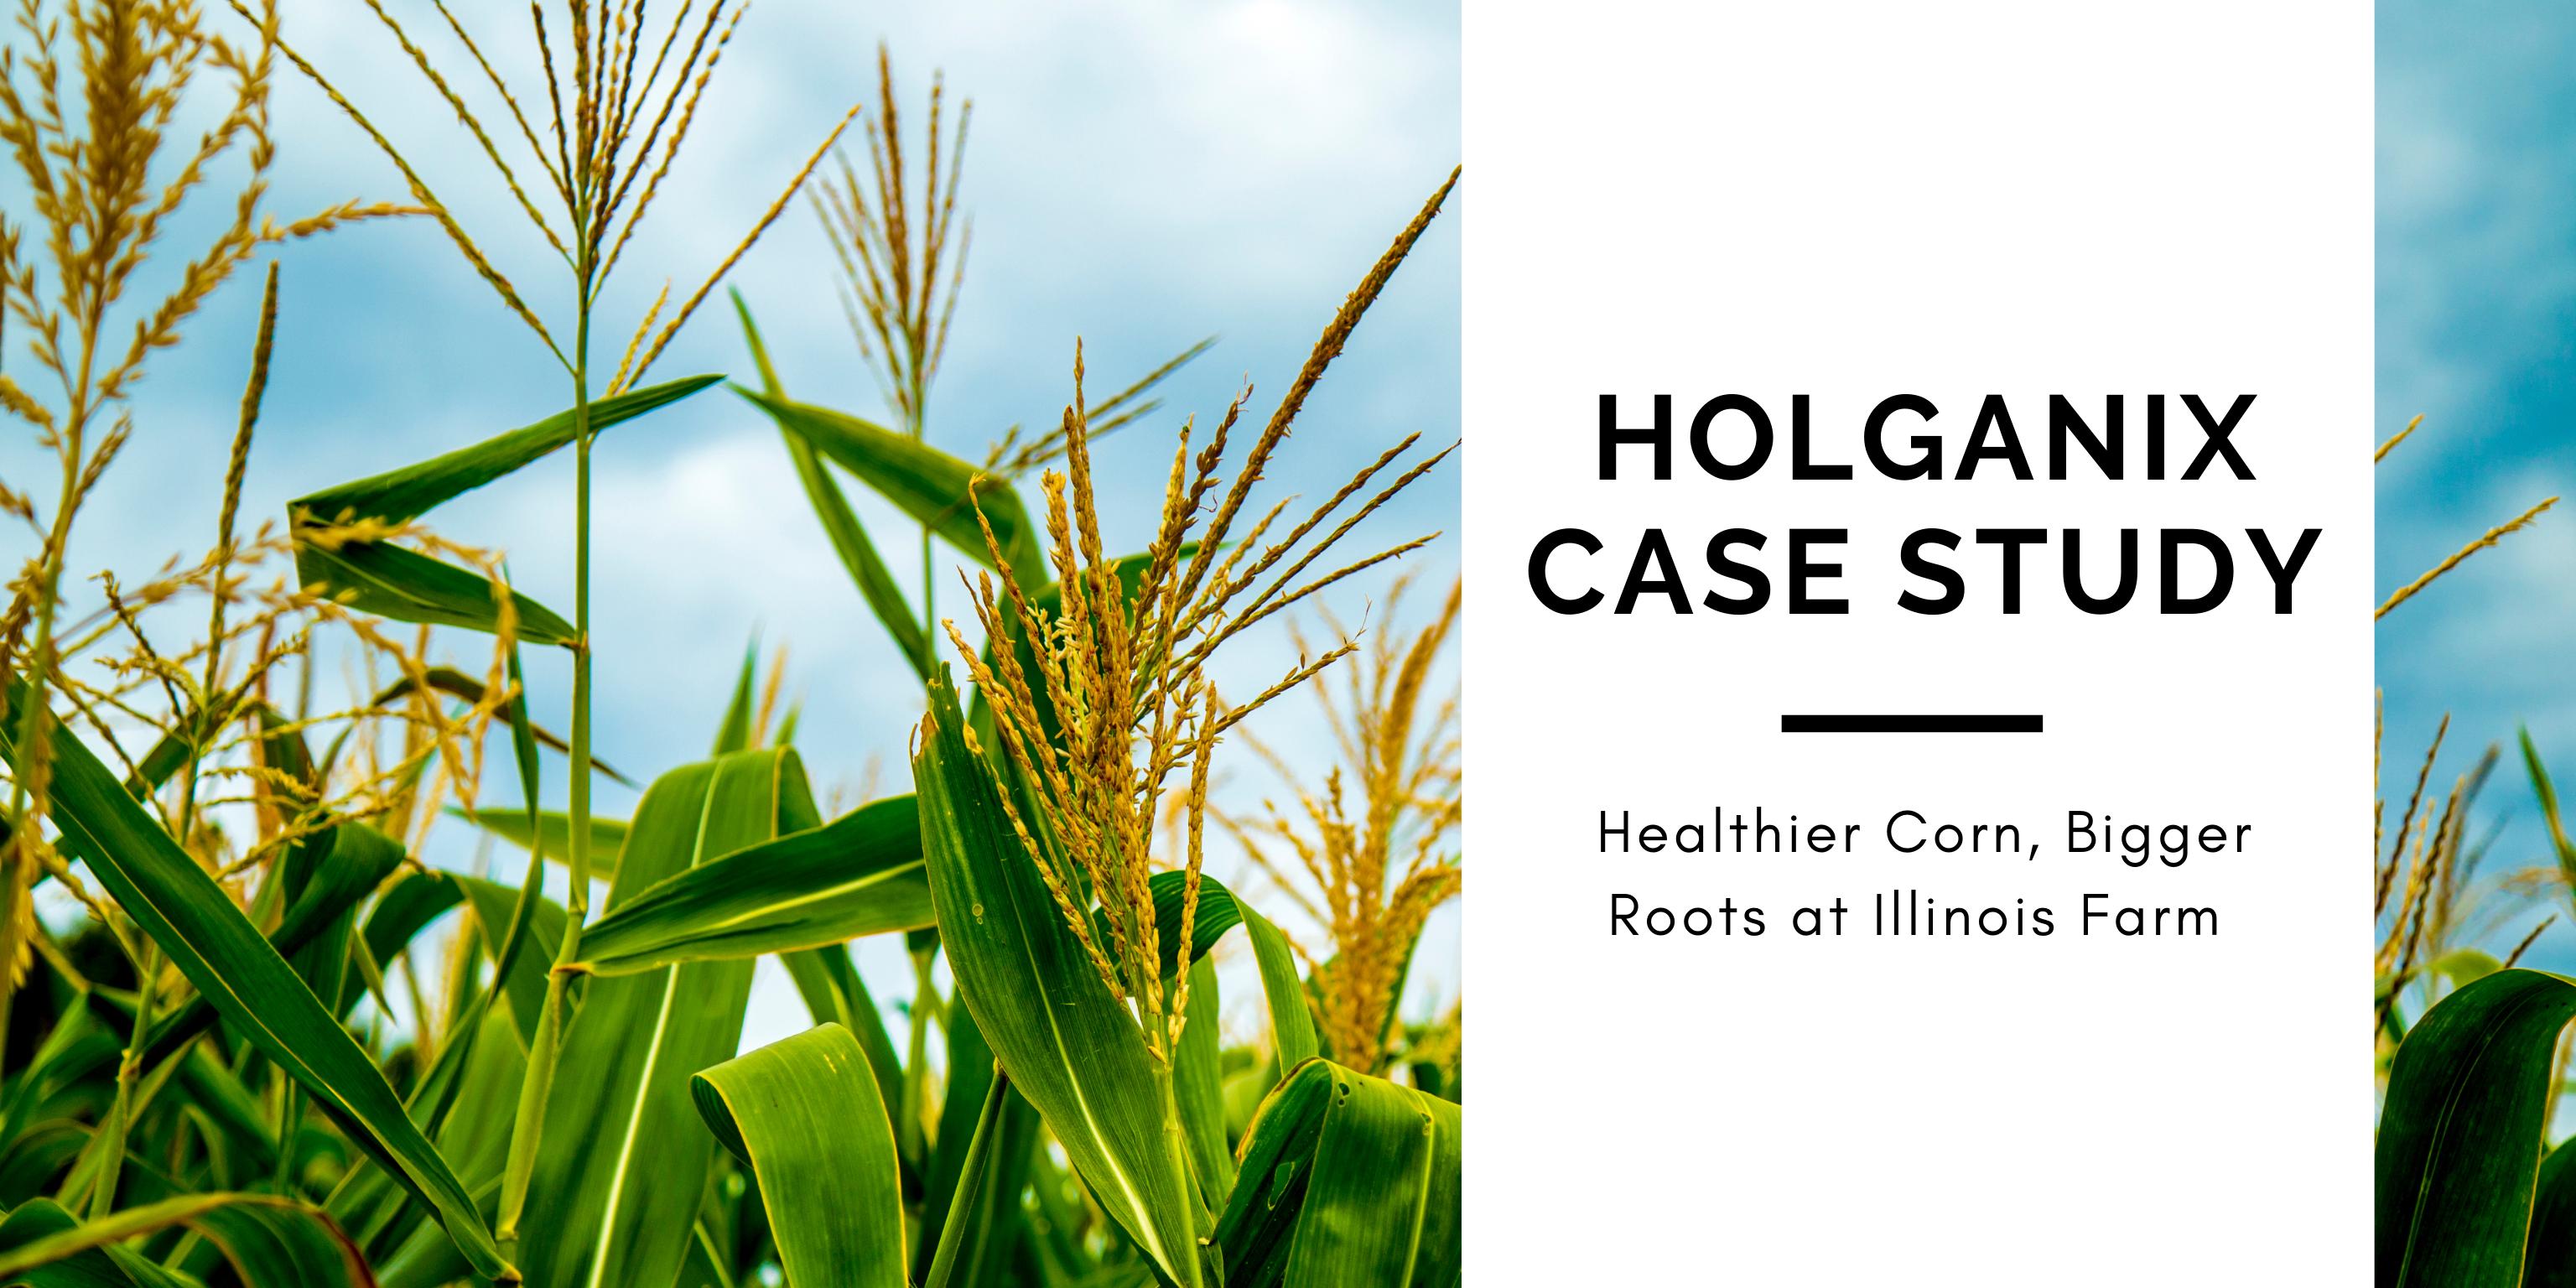 Corn case study